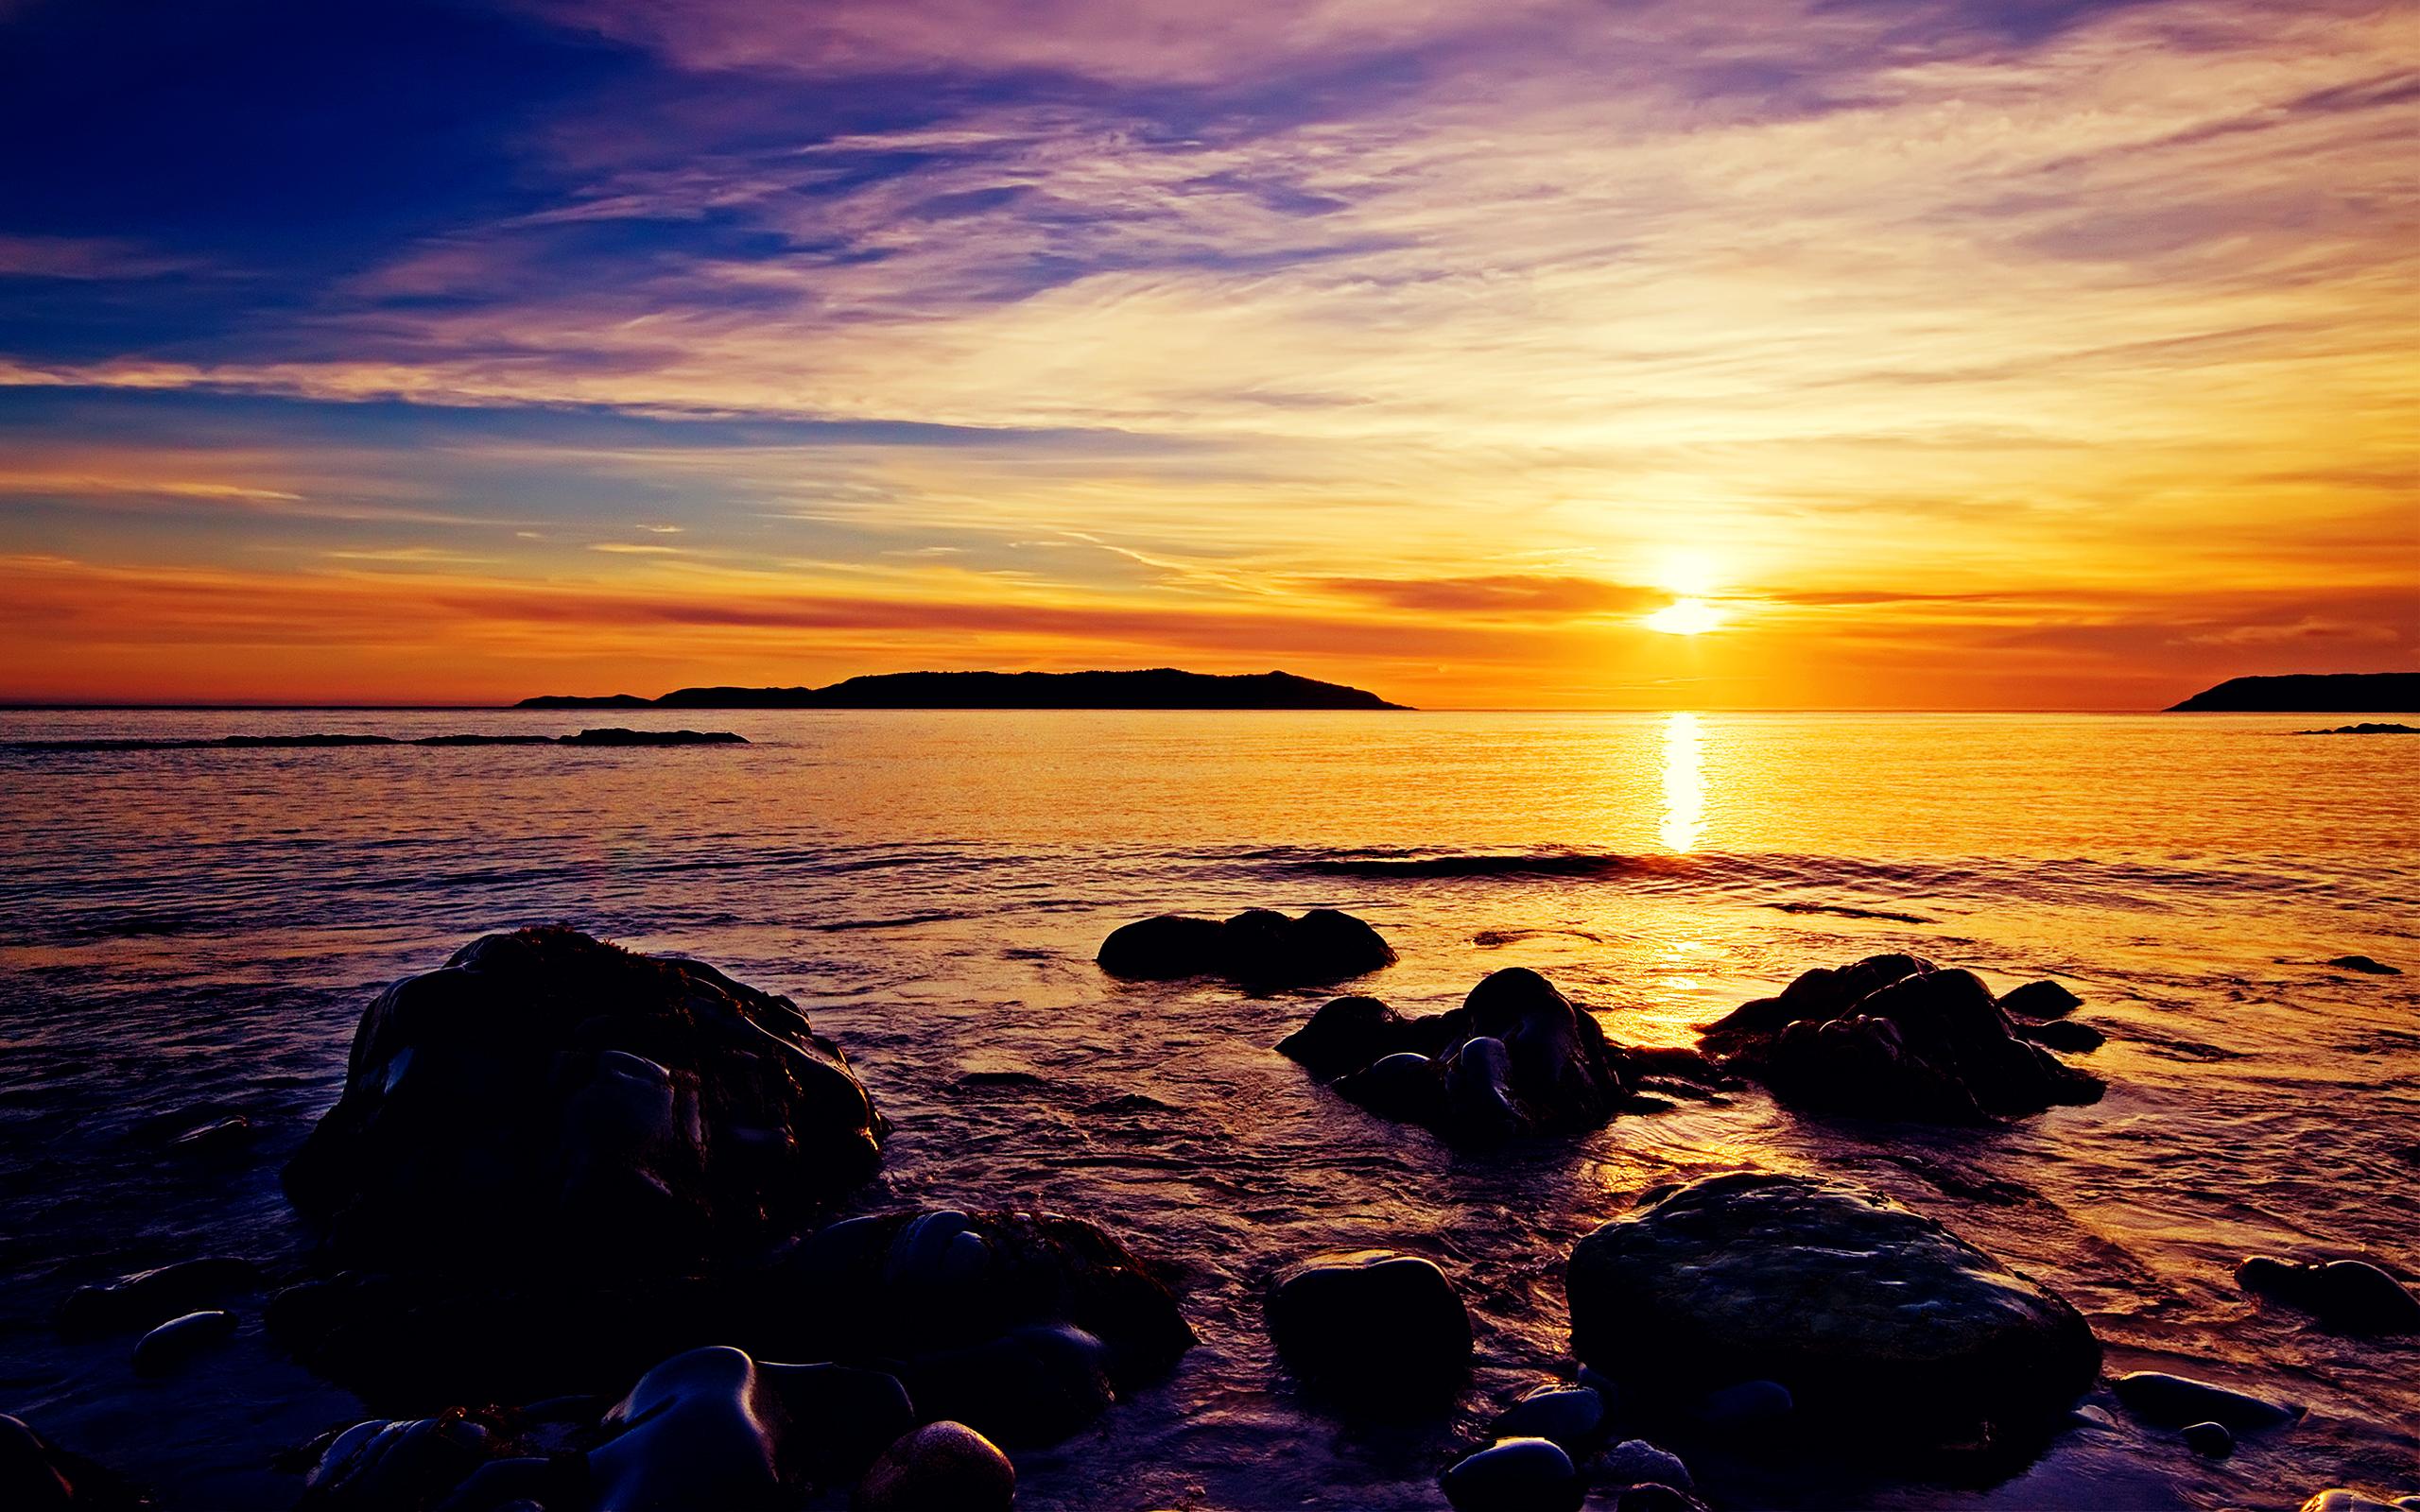 Sunrise Beach Wallpapers HD Wallpapers 2560x1600